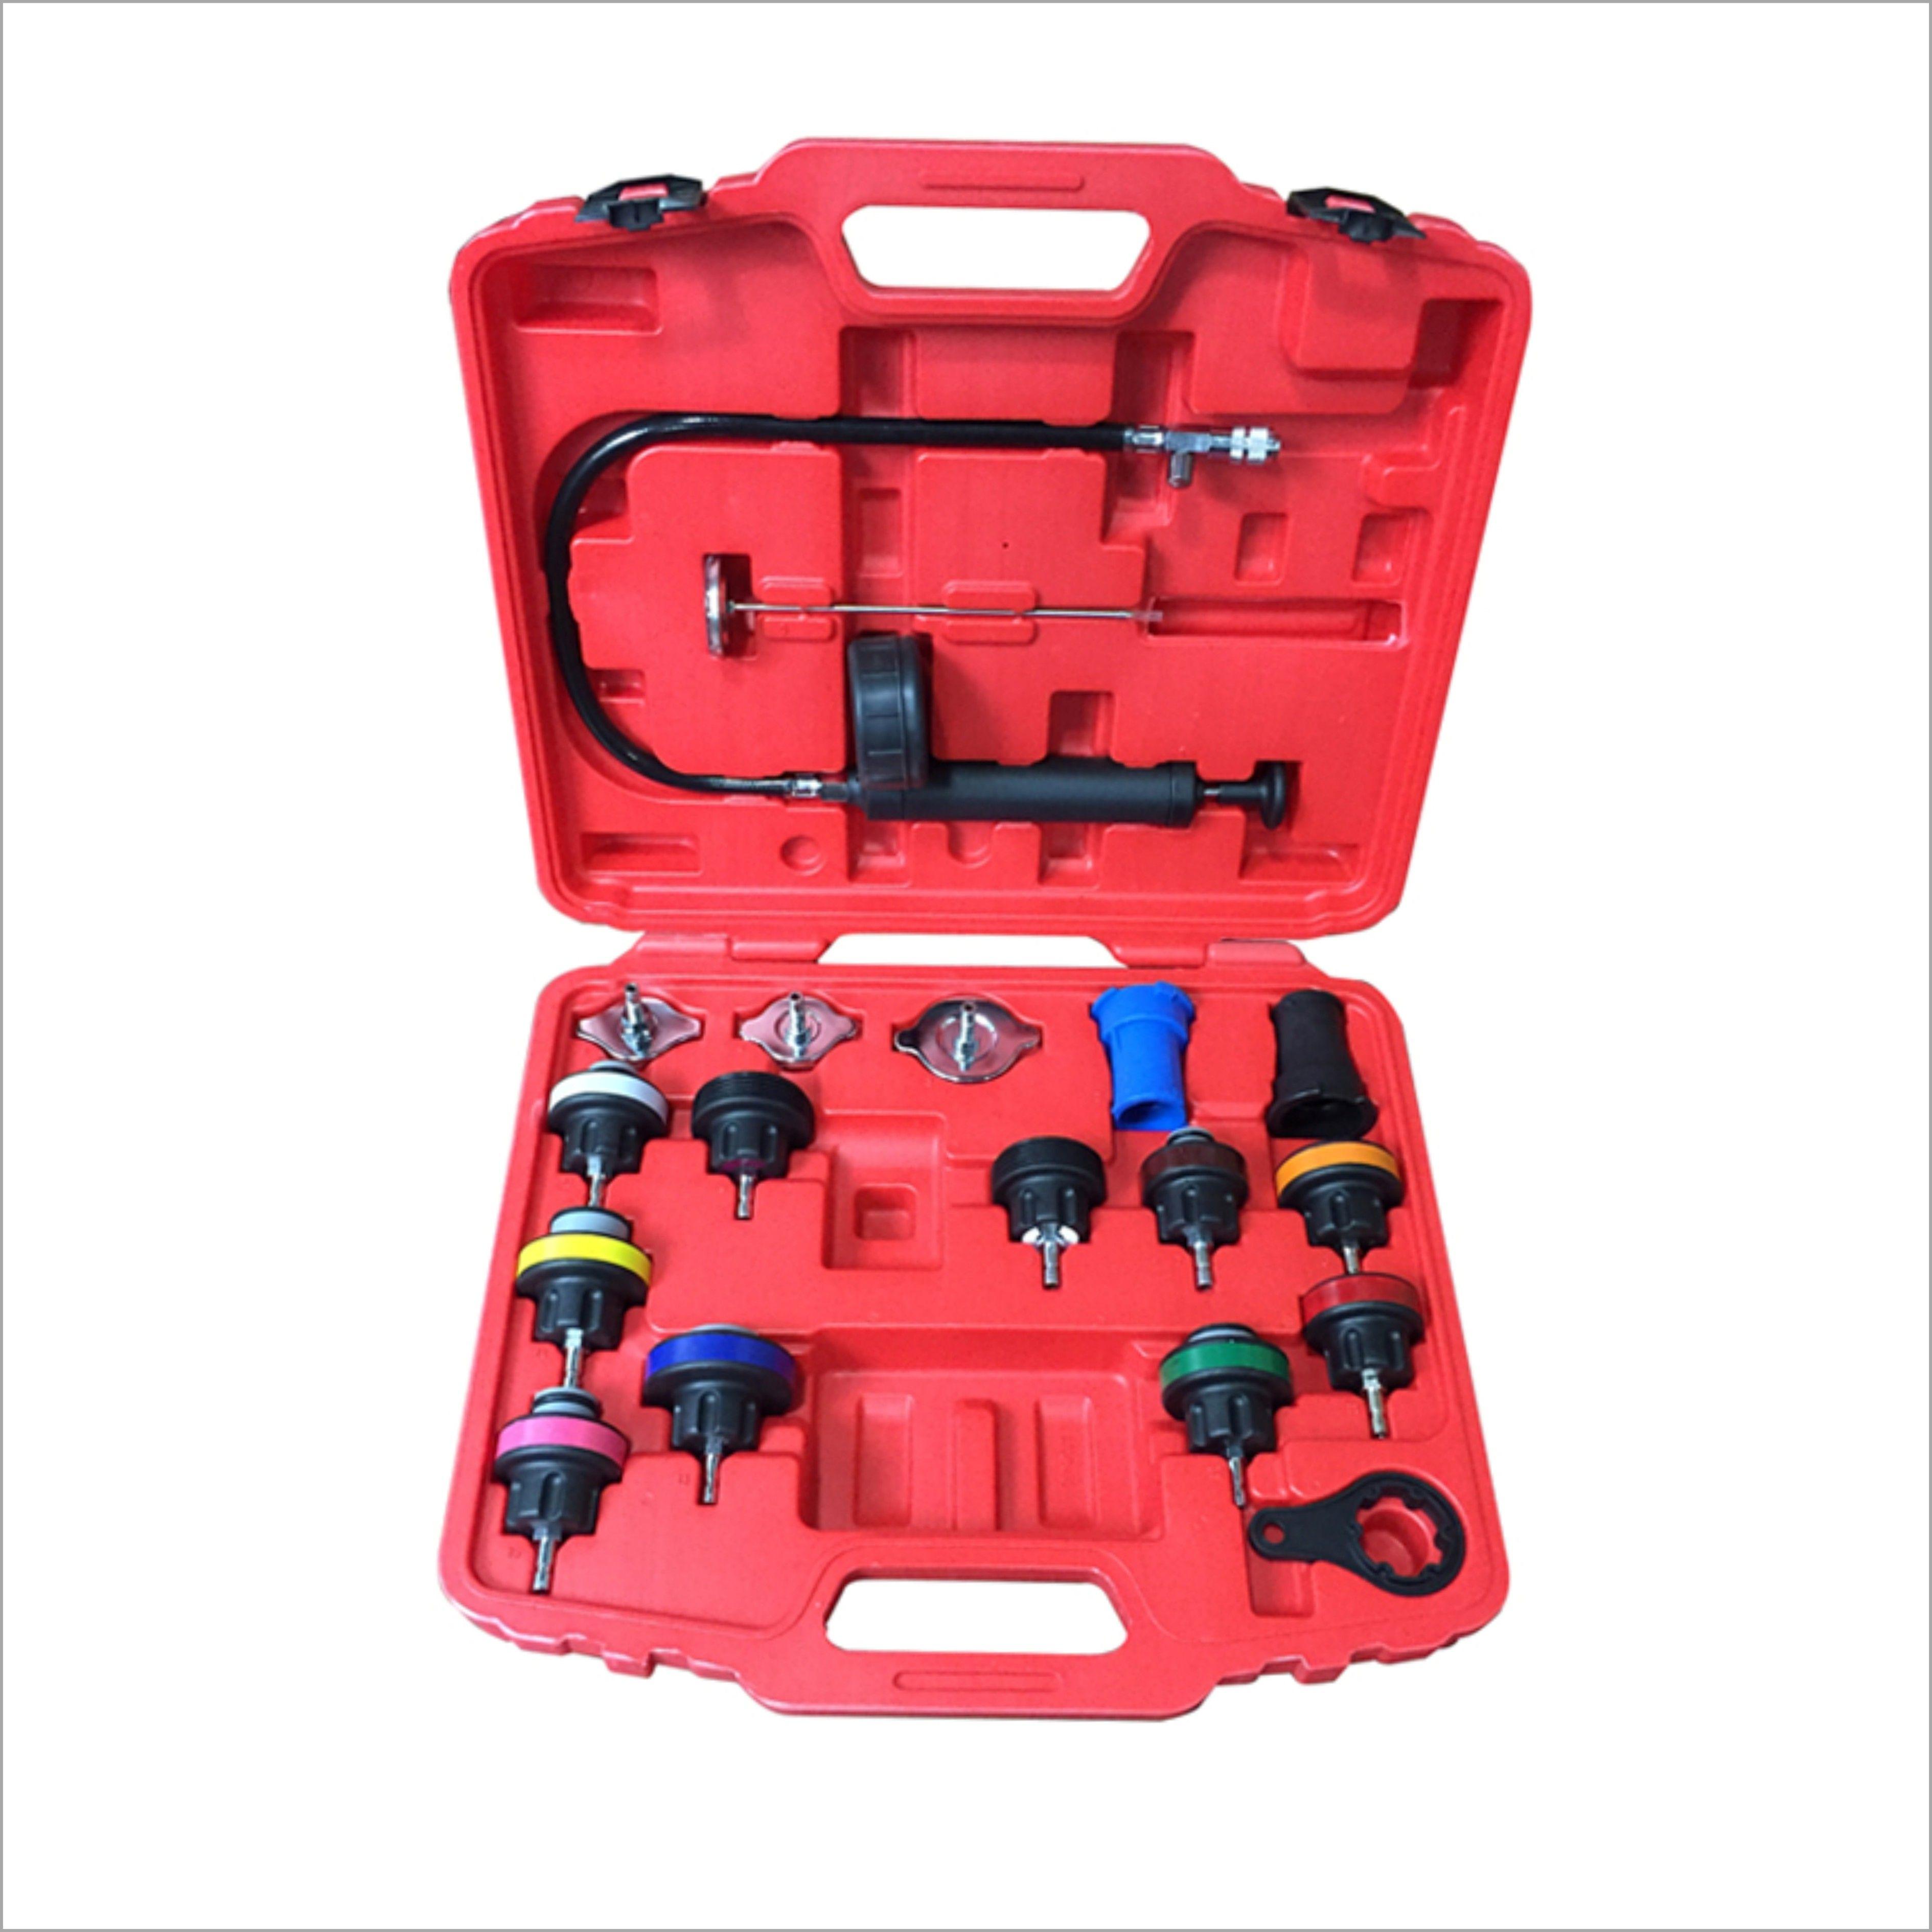 18pcs Universal Radiator Pressure Tester Kit Car Water Tank Leak